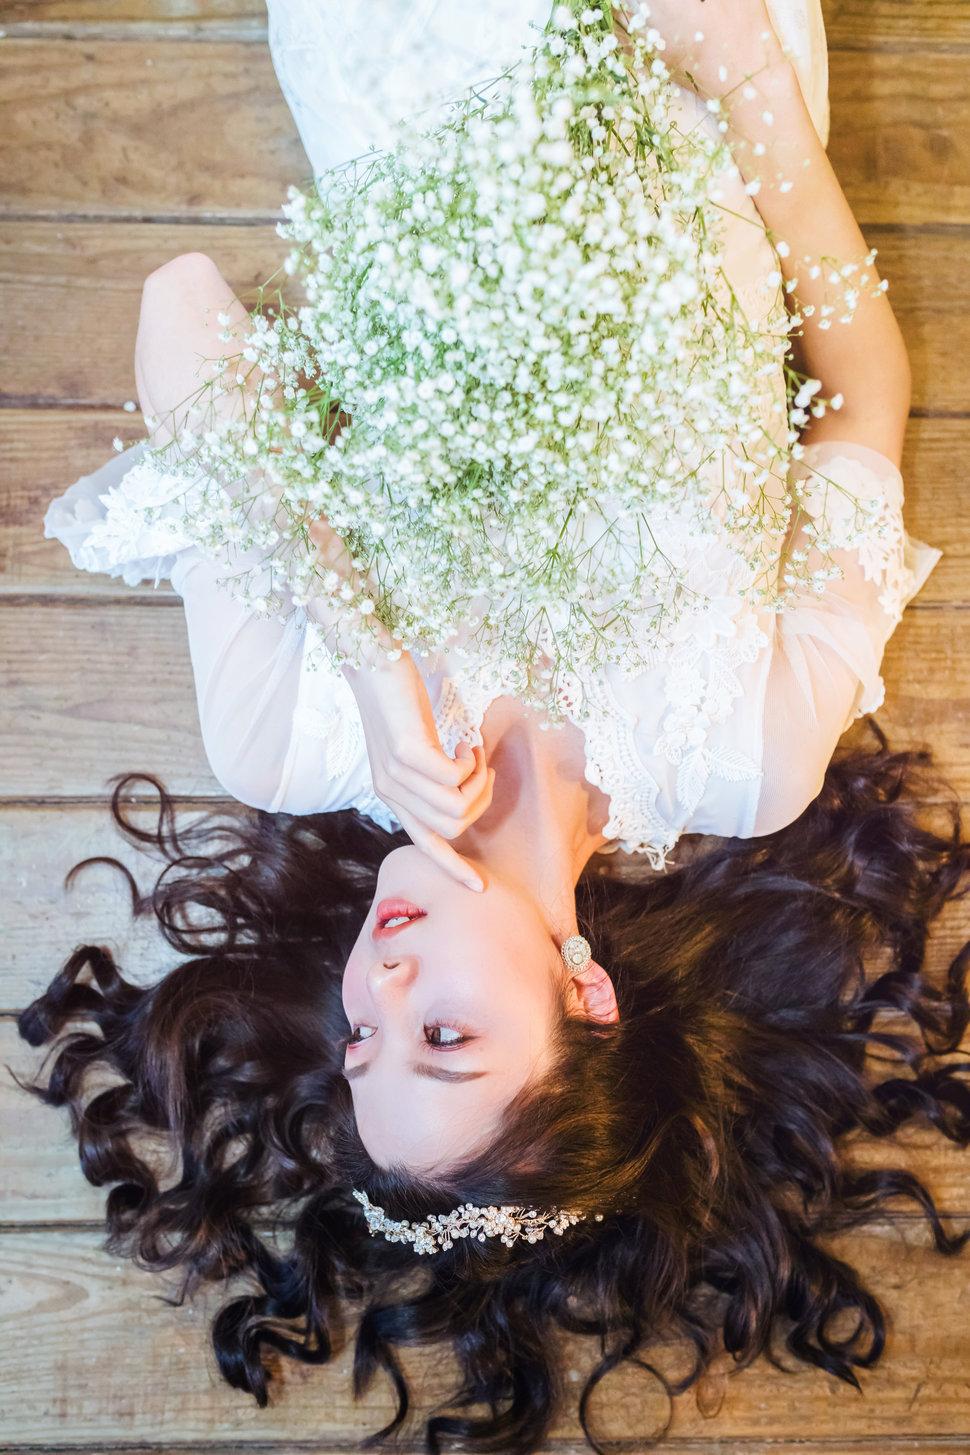 005D4_0772 - Promaker婚禮紀錄攝影團隊婚攝豪哥《結婚吧》